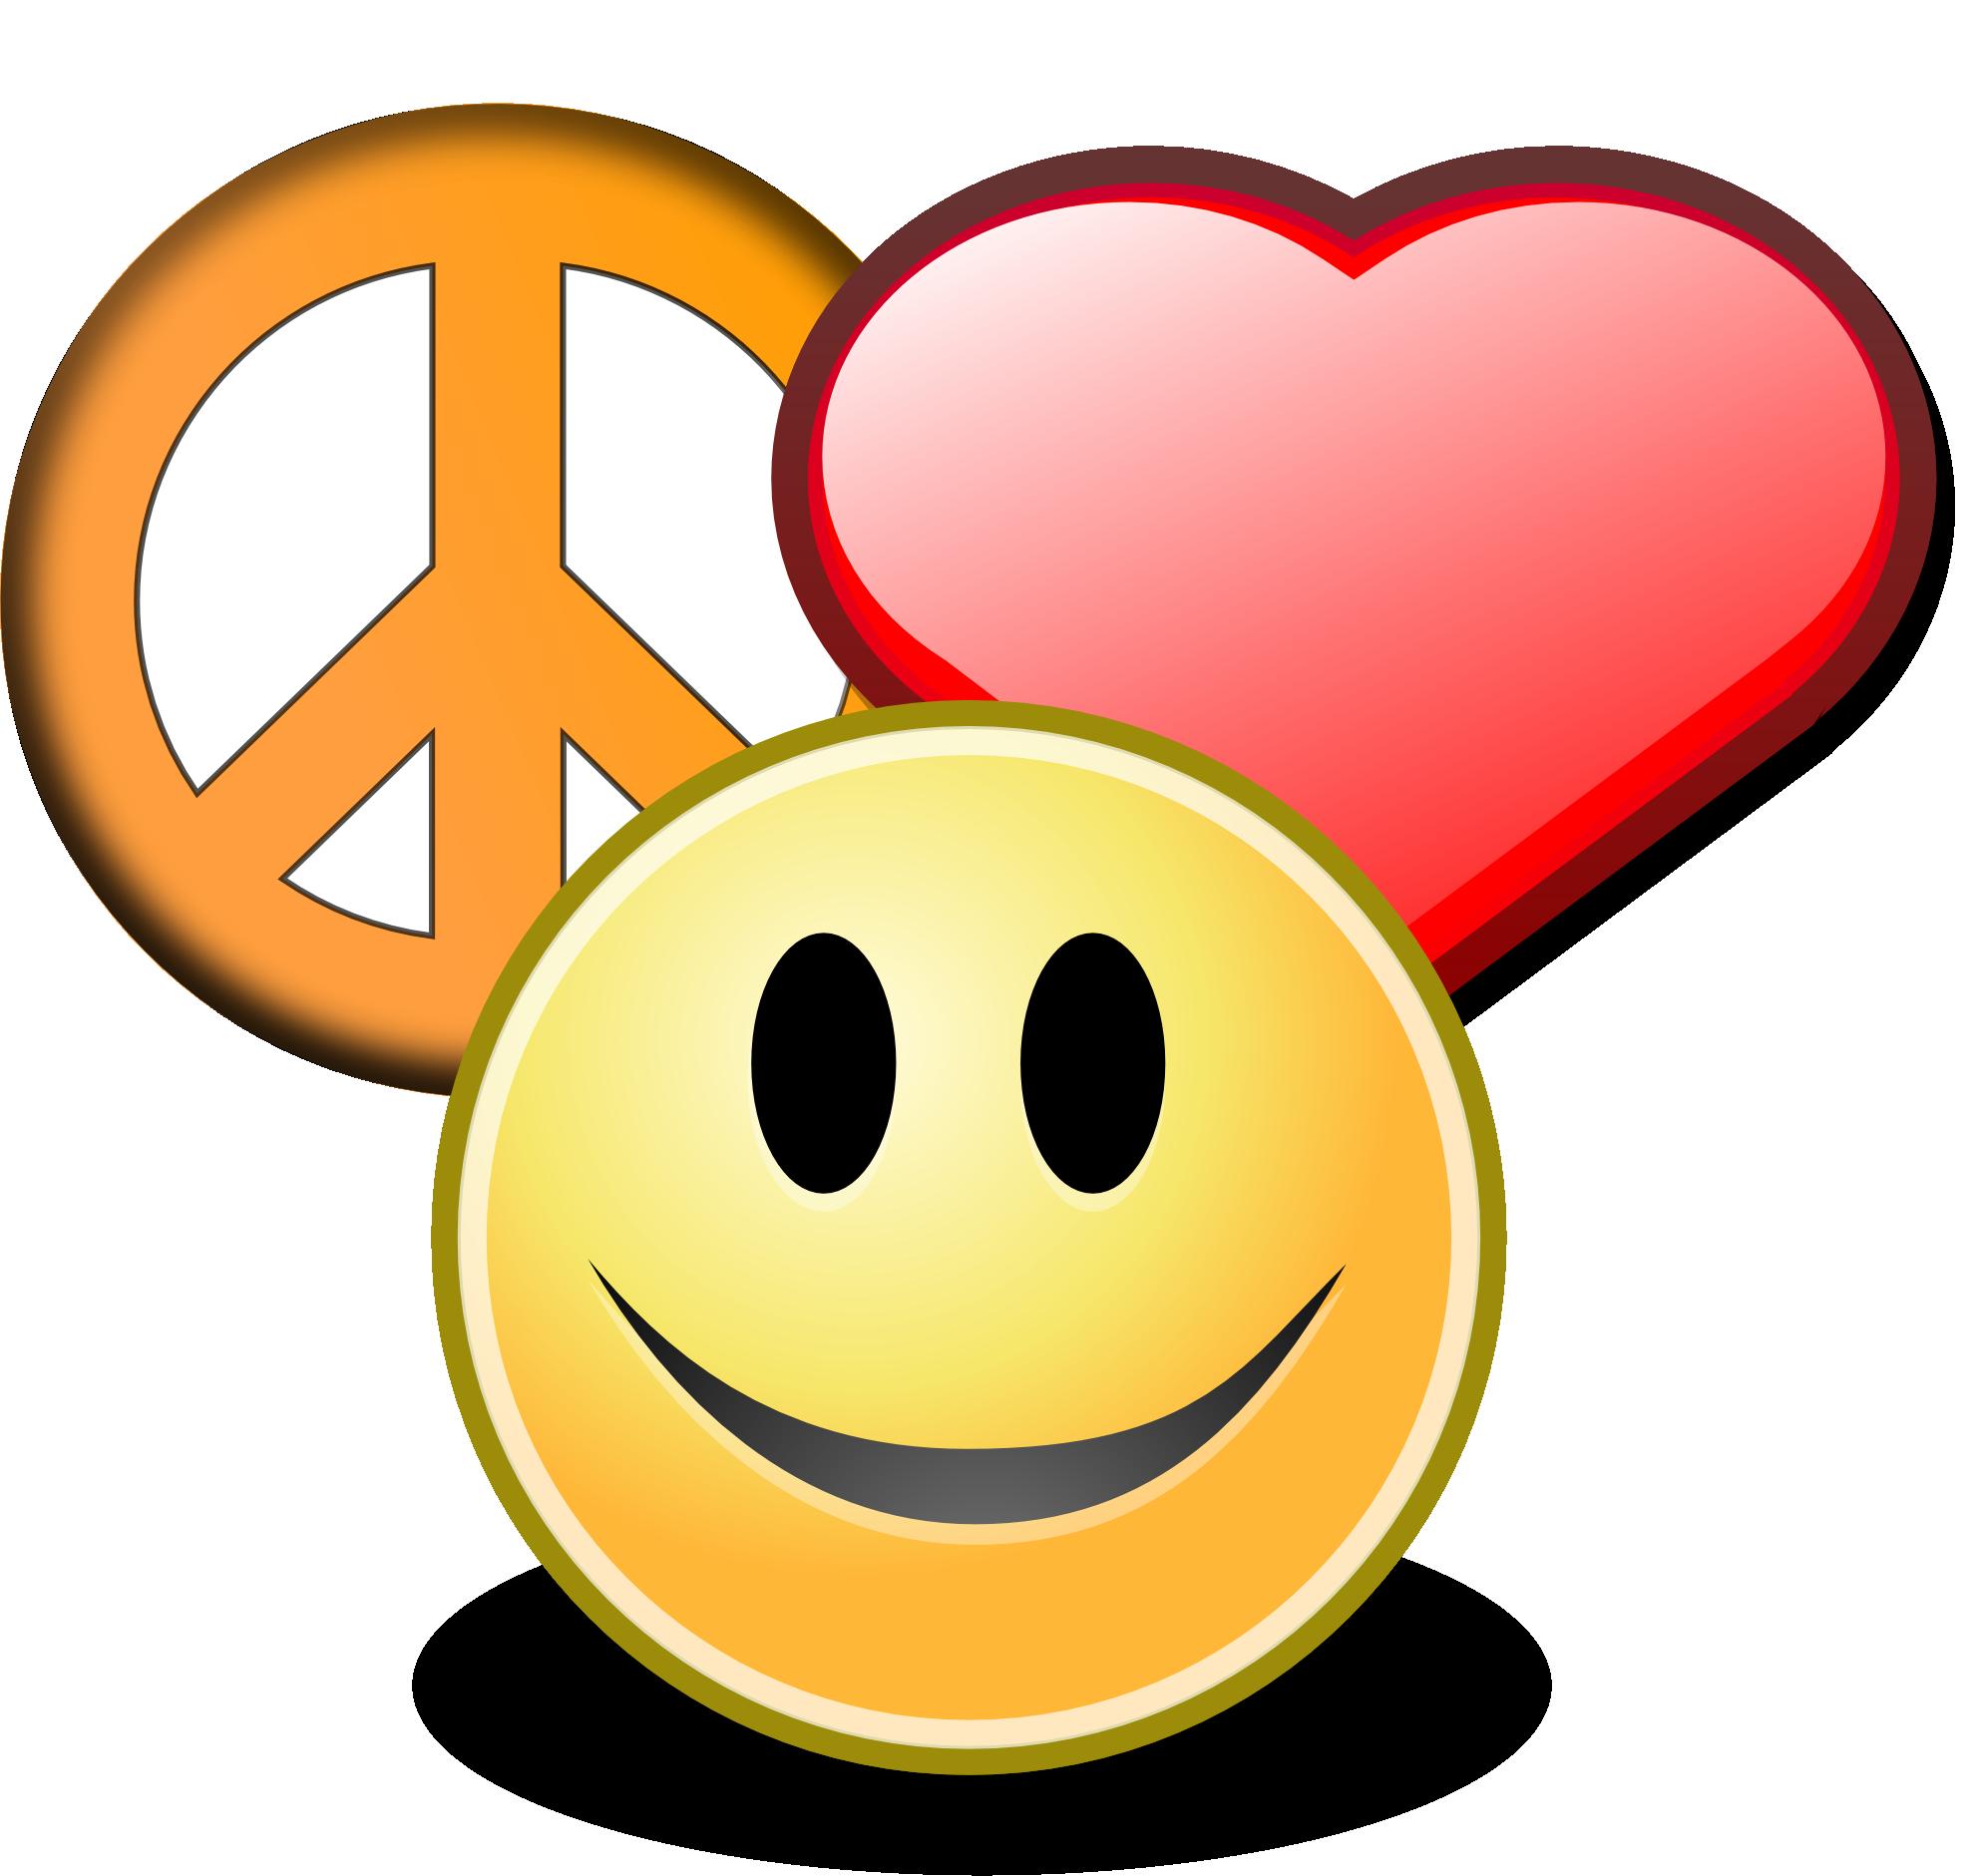 Peace clipart peace border. Peach clip art free